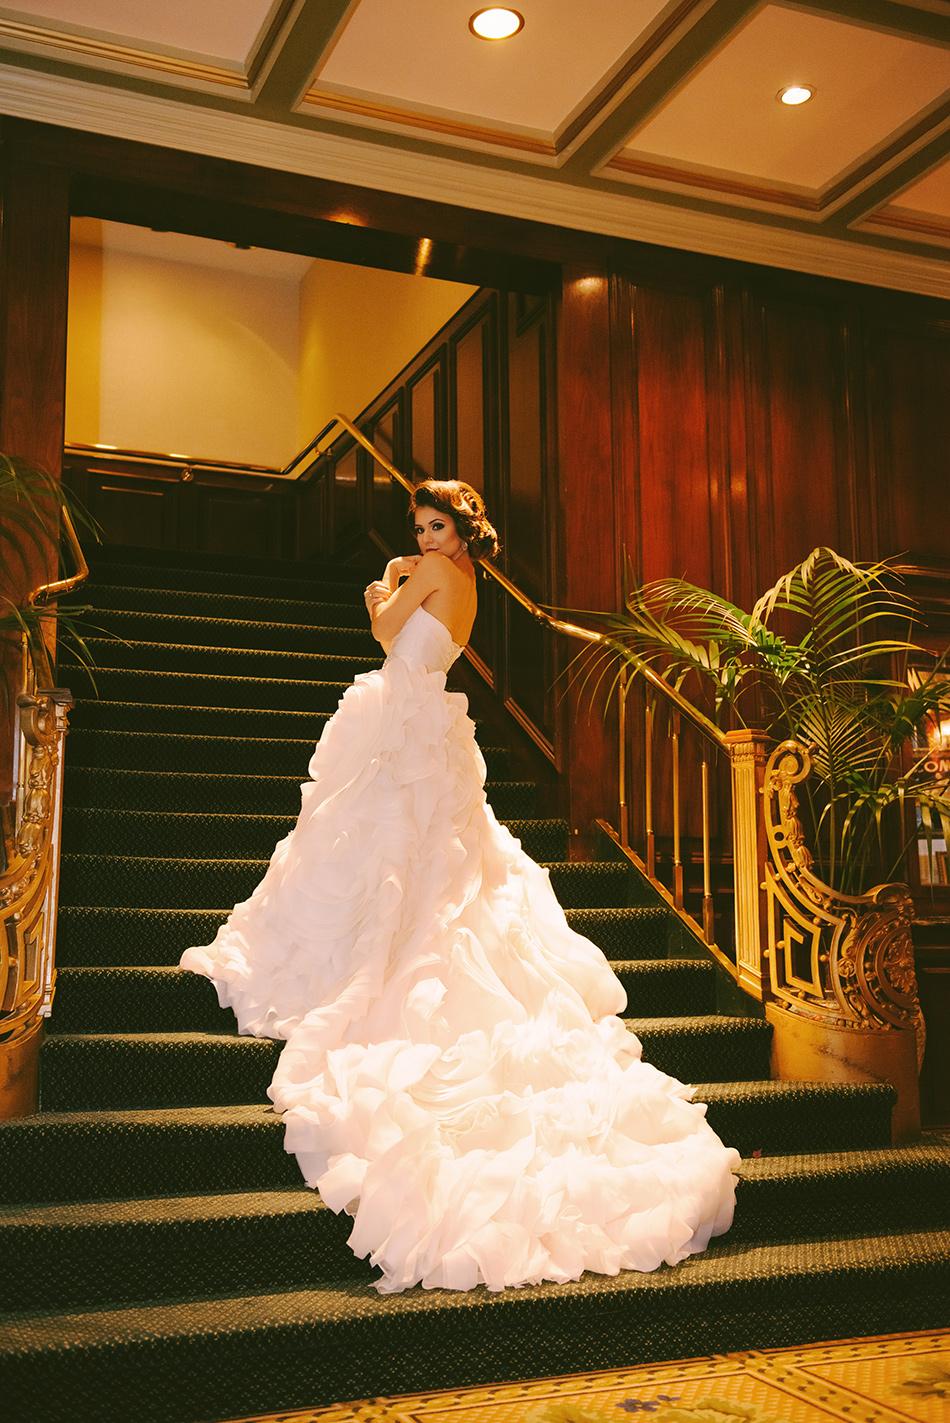 AD Passion Photography | stephany-and-nathan-wedding-dallas_076 | Adelin, Dida, fotograf profesionist, fotograf de nunta, fotografie de nunta, fotograf Timisoara, fotograf Craiova, fotograf Bucuresti, fotograf Arad, nunta Timisoara, nunta Arad, nunta Bucuresti, nunta Craiova